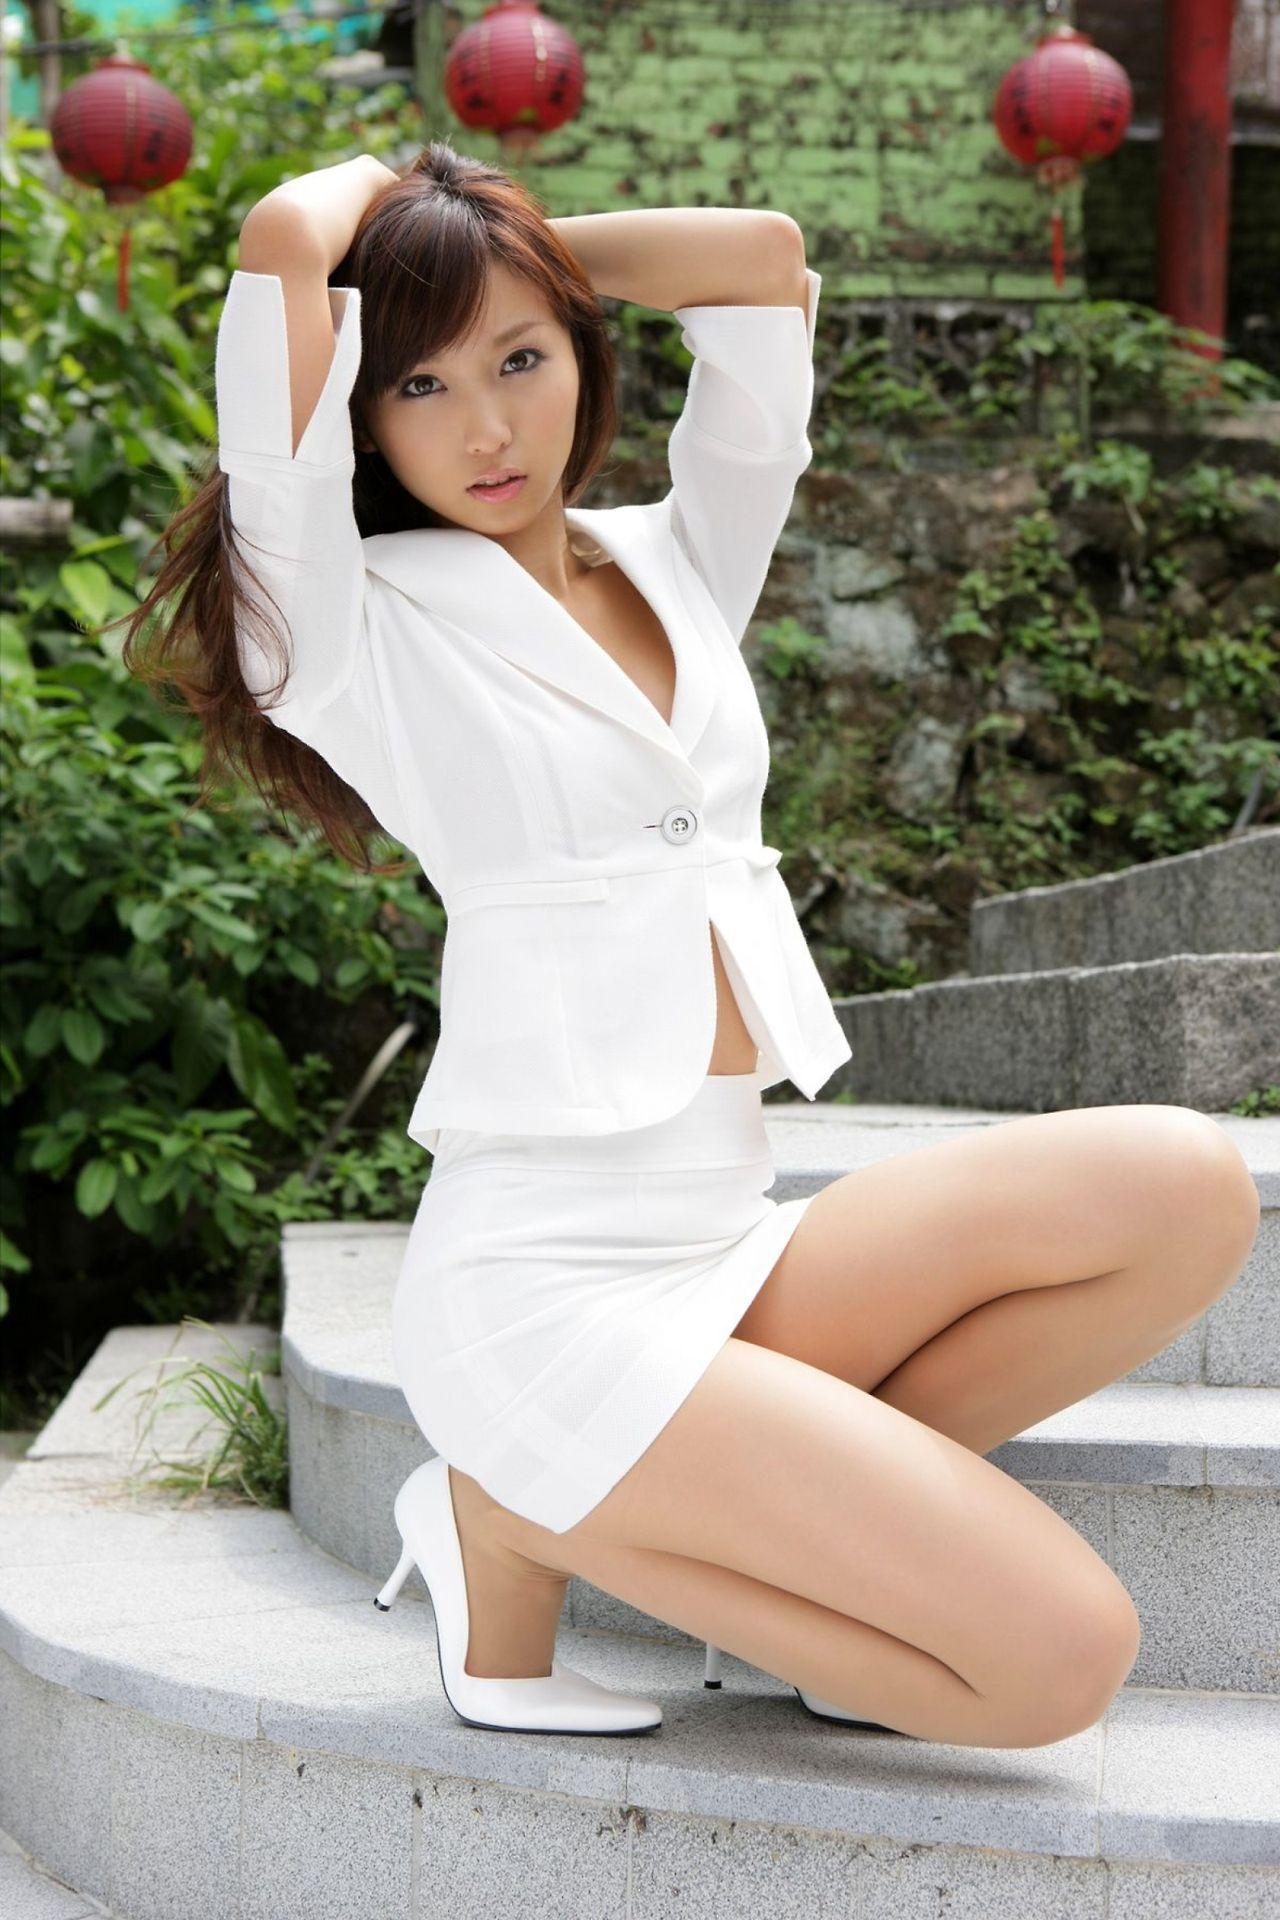 Japanese miniskirt babes — img 3